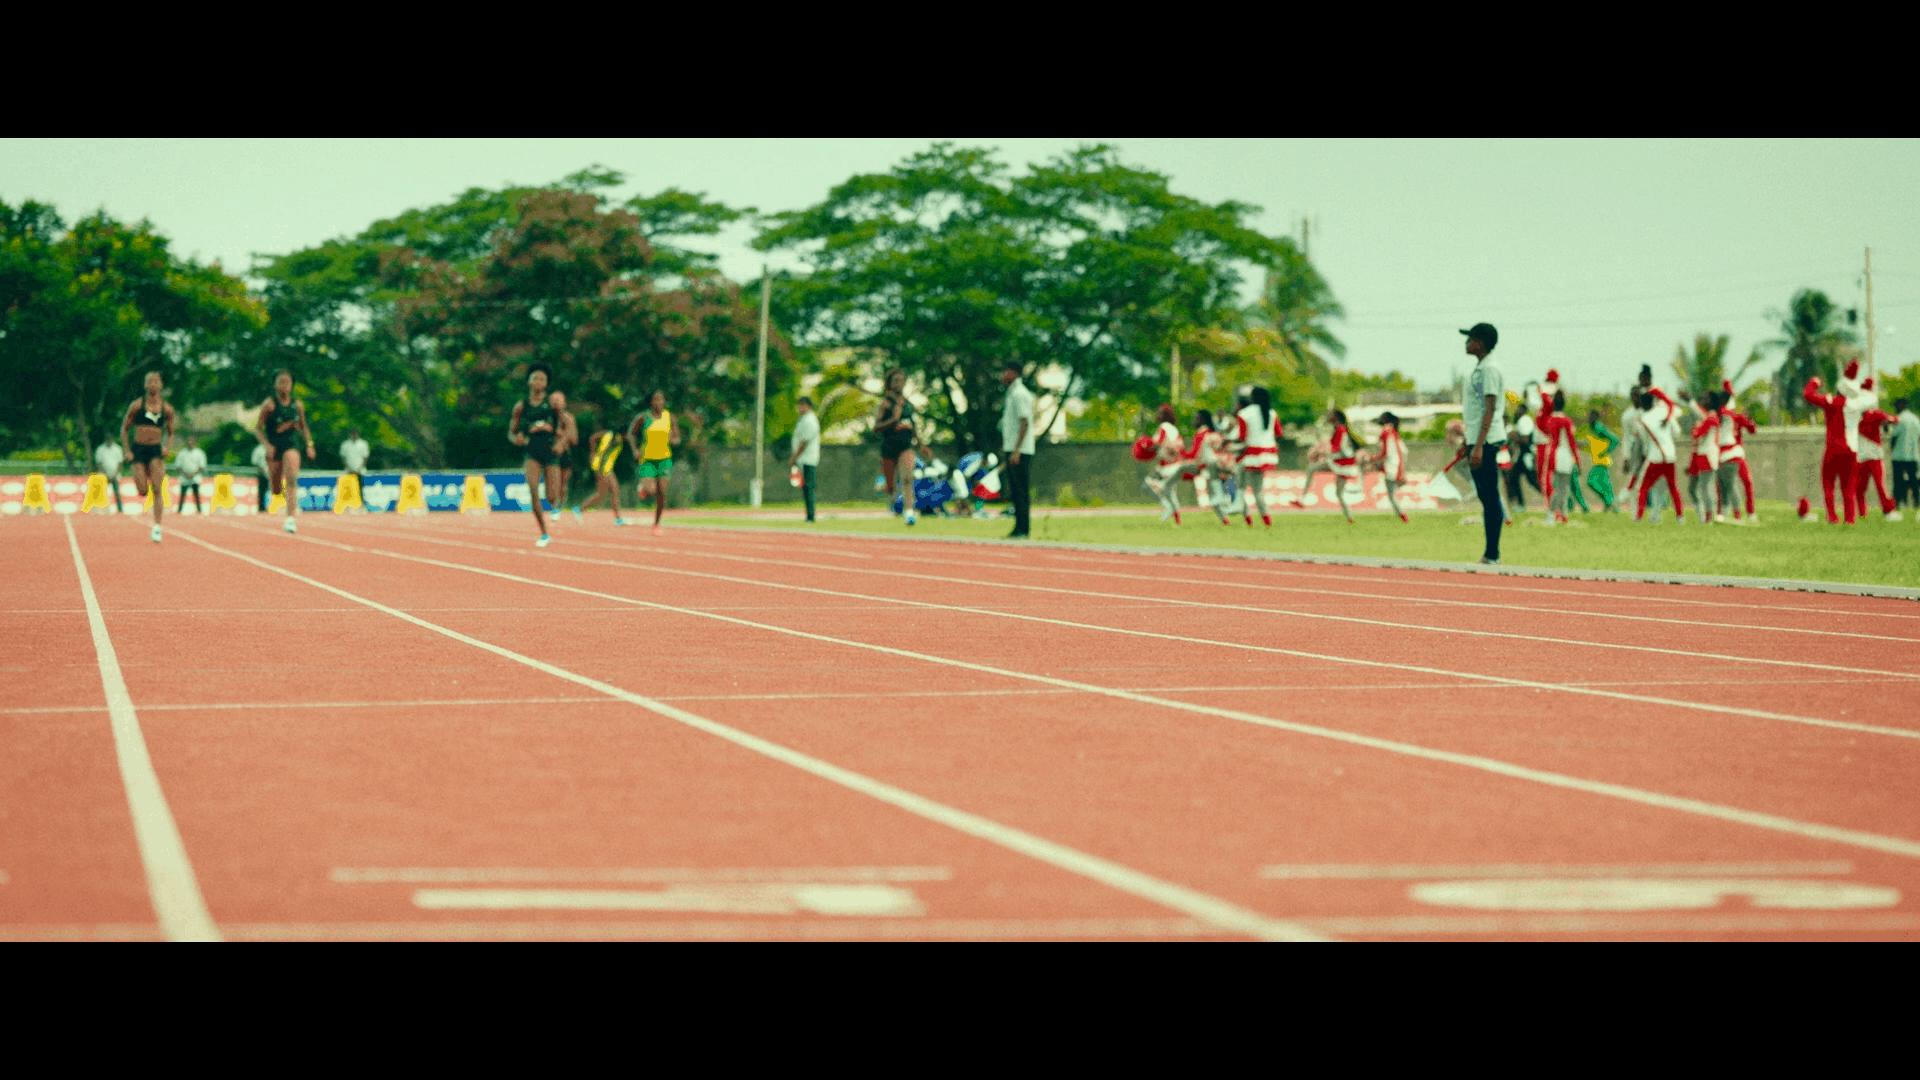 Sprinter Blu-ray MVD Digital release